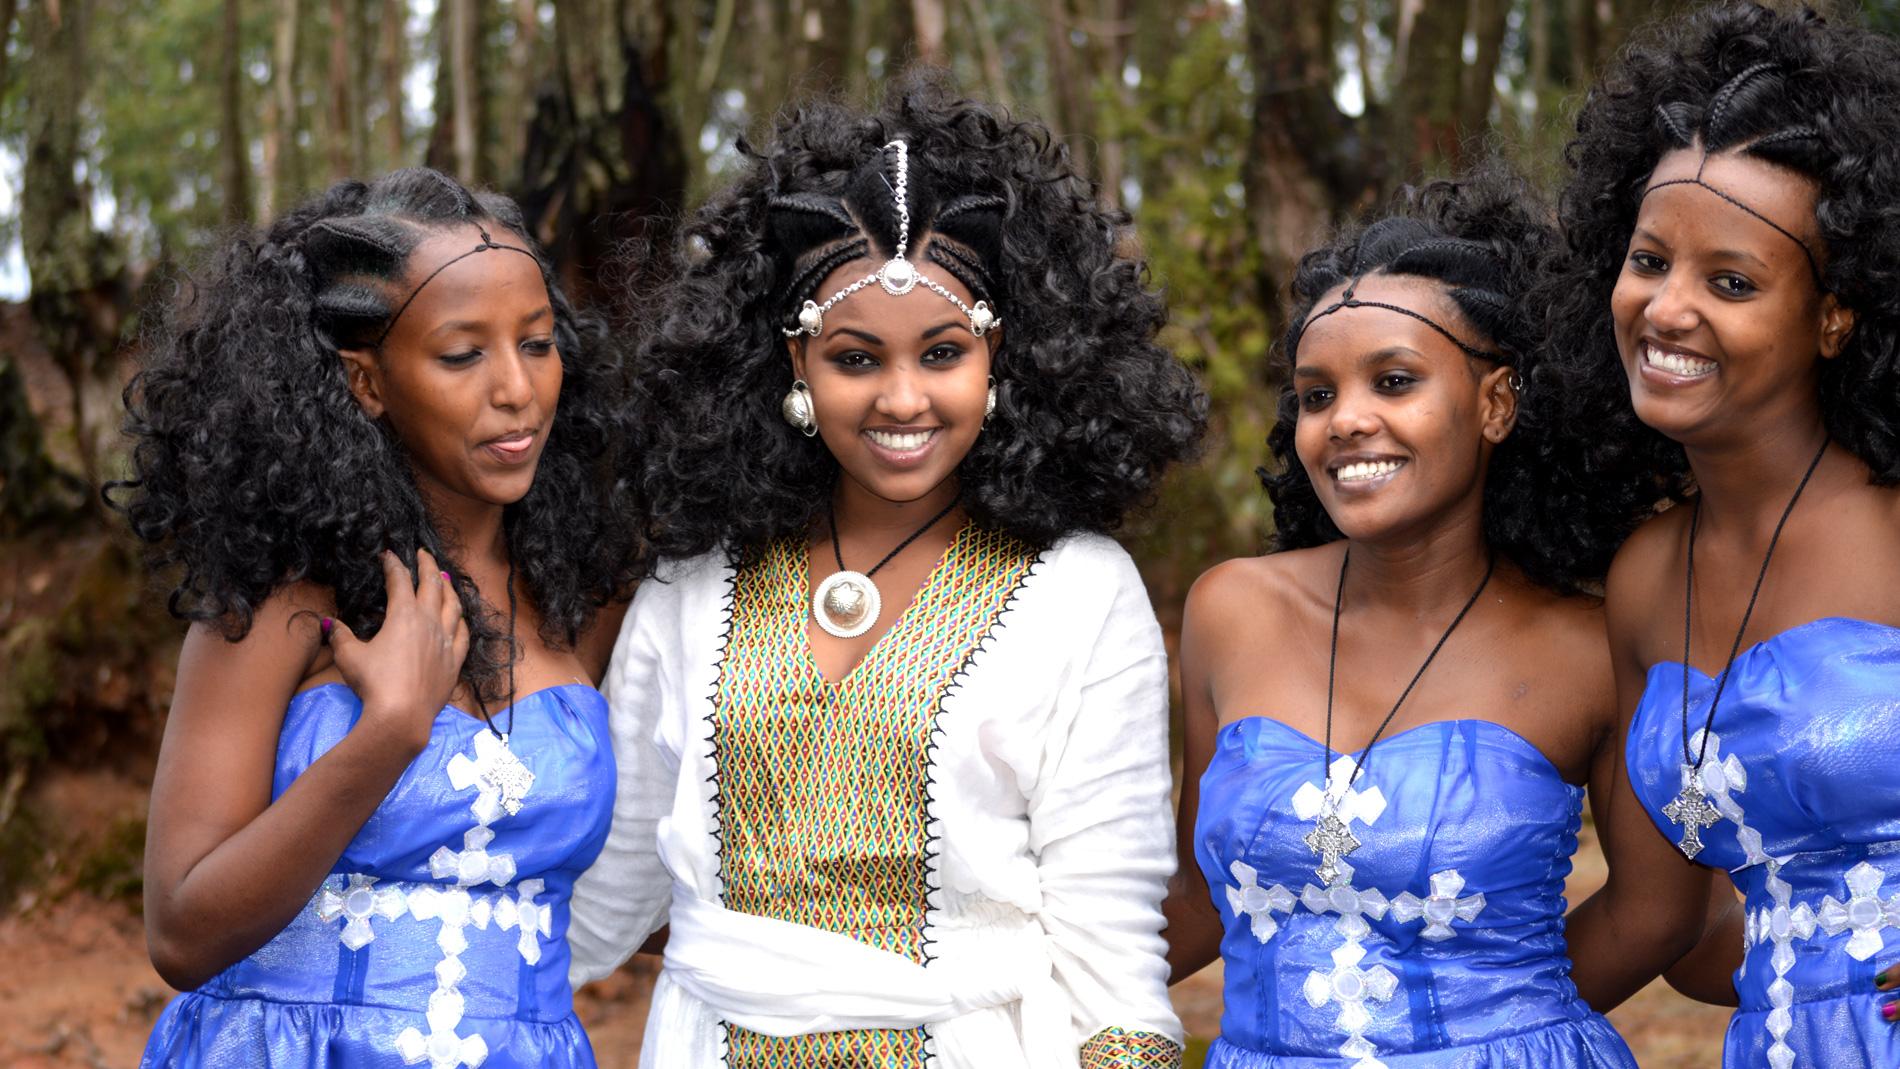 Ethiopia is Africa's next big tourist draw | CNN Travel